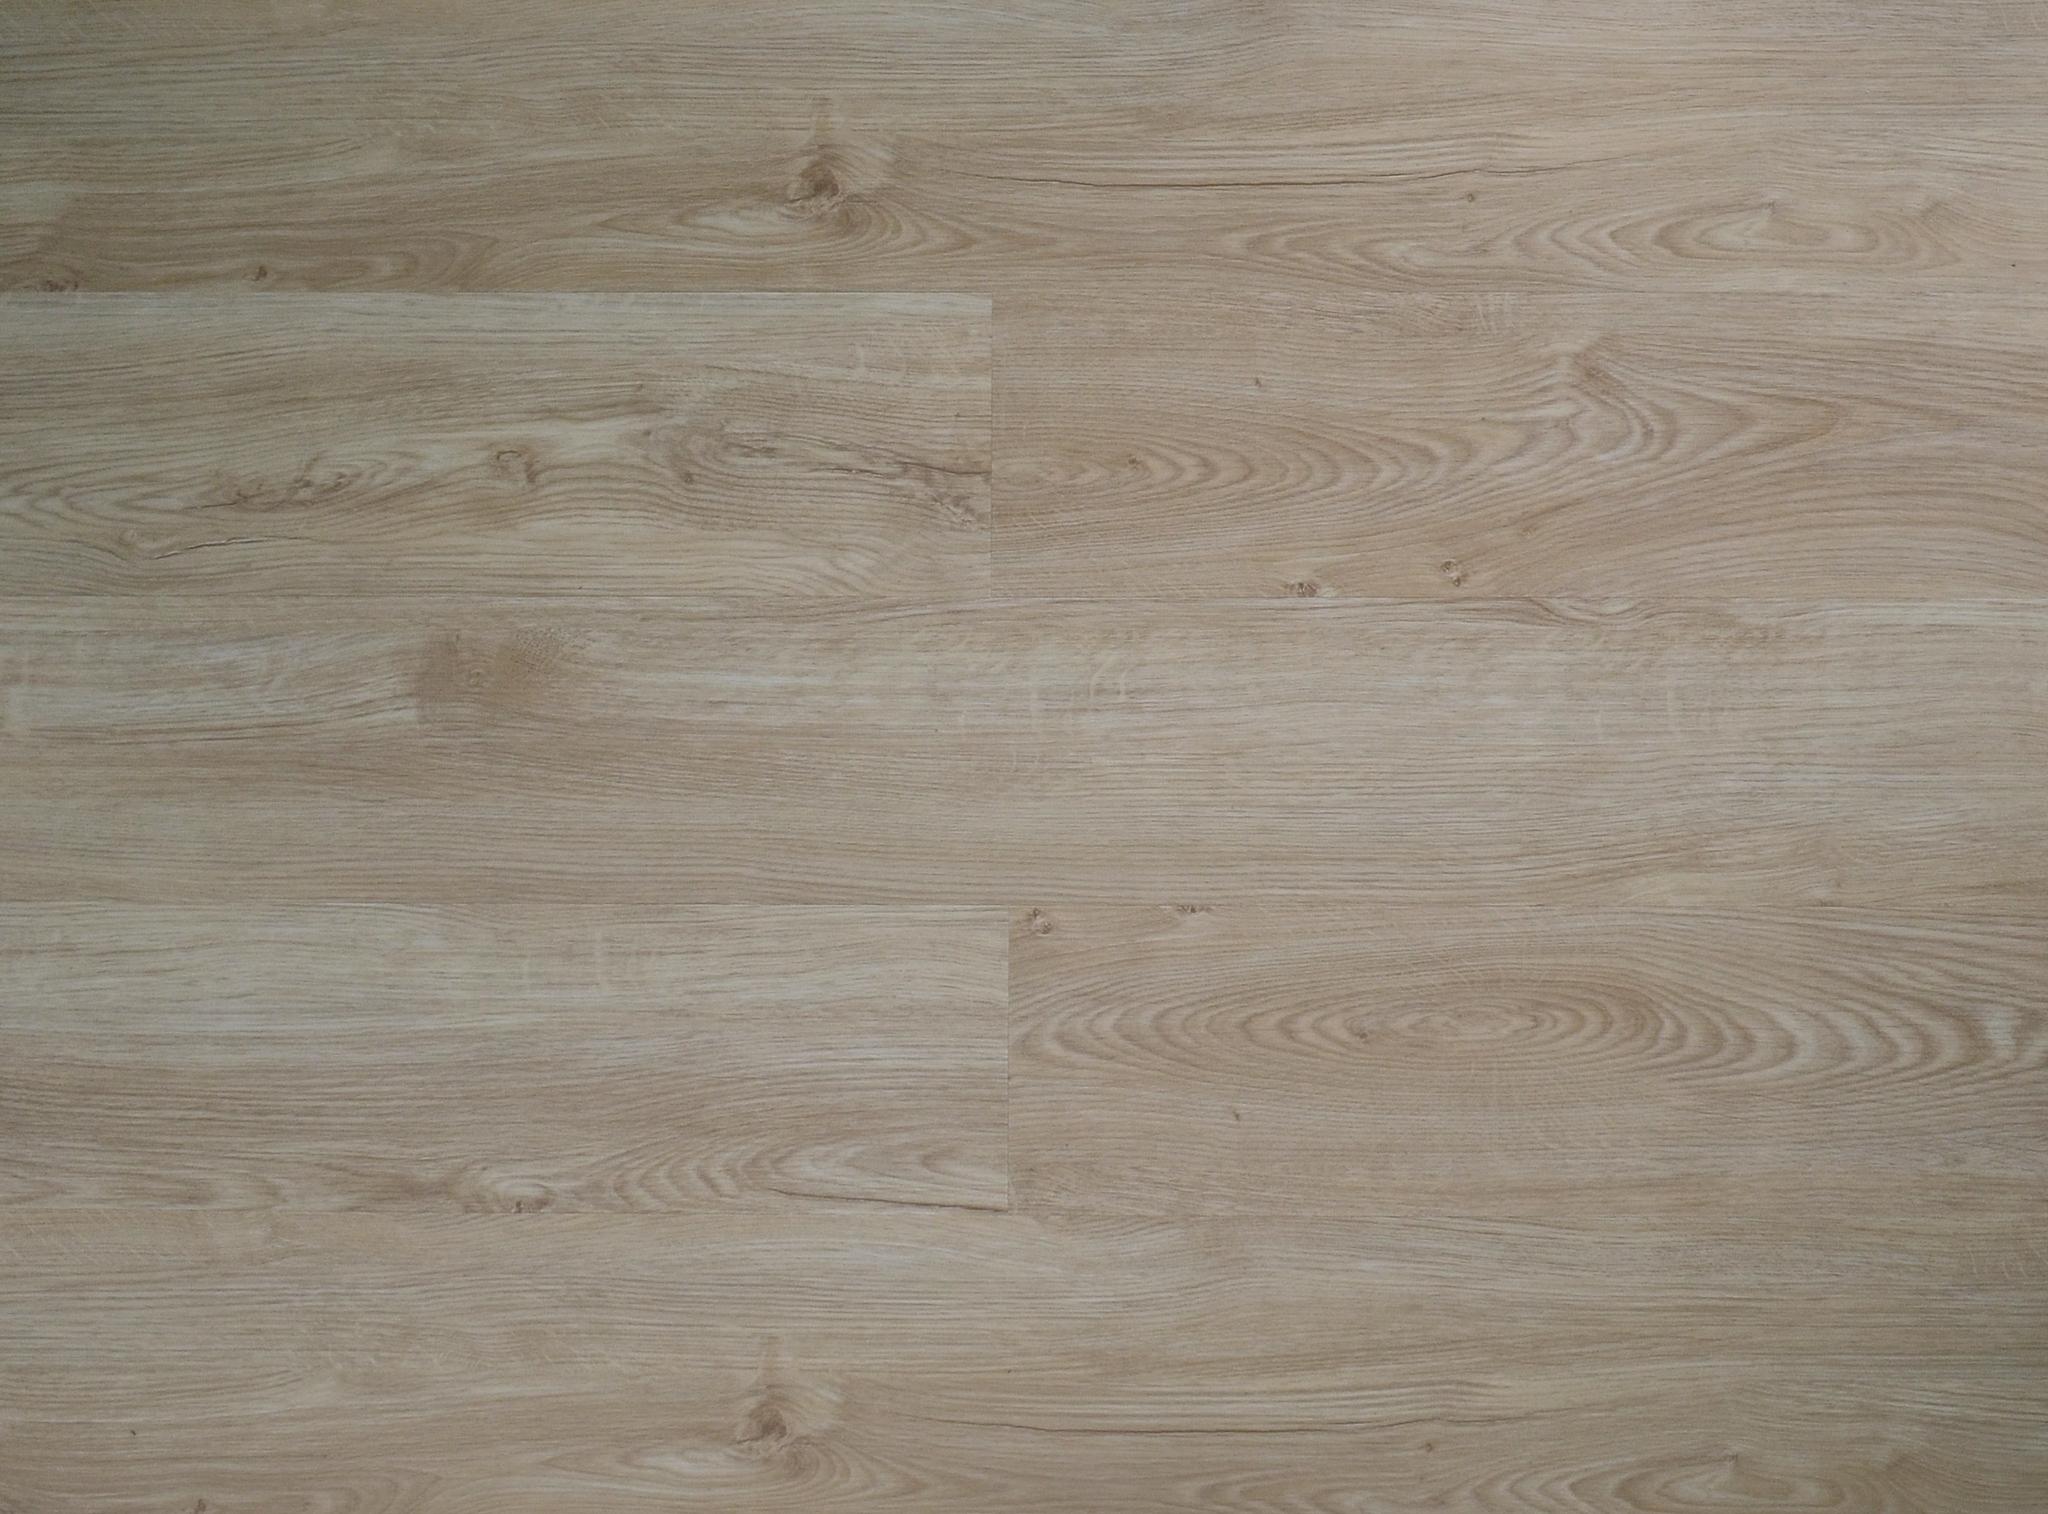 Виниловый пол Concept Floor - Fit Line Eiche Champagne (Дуб Champagne)